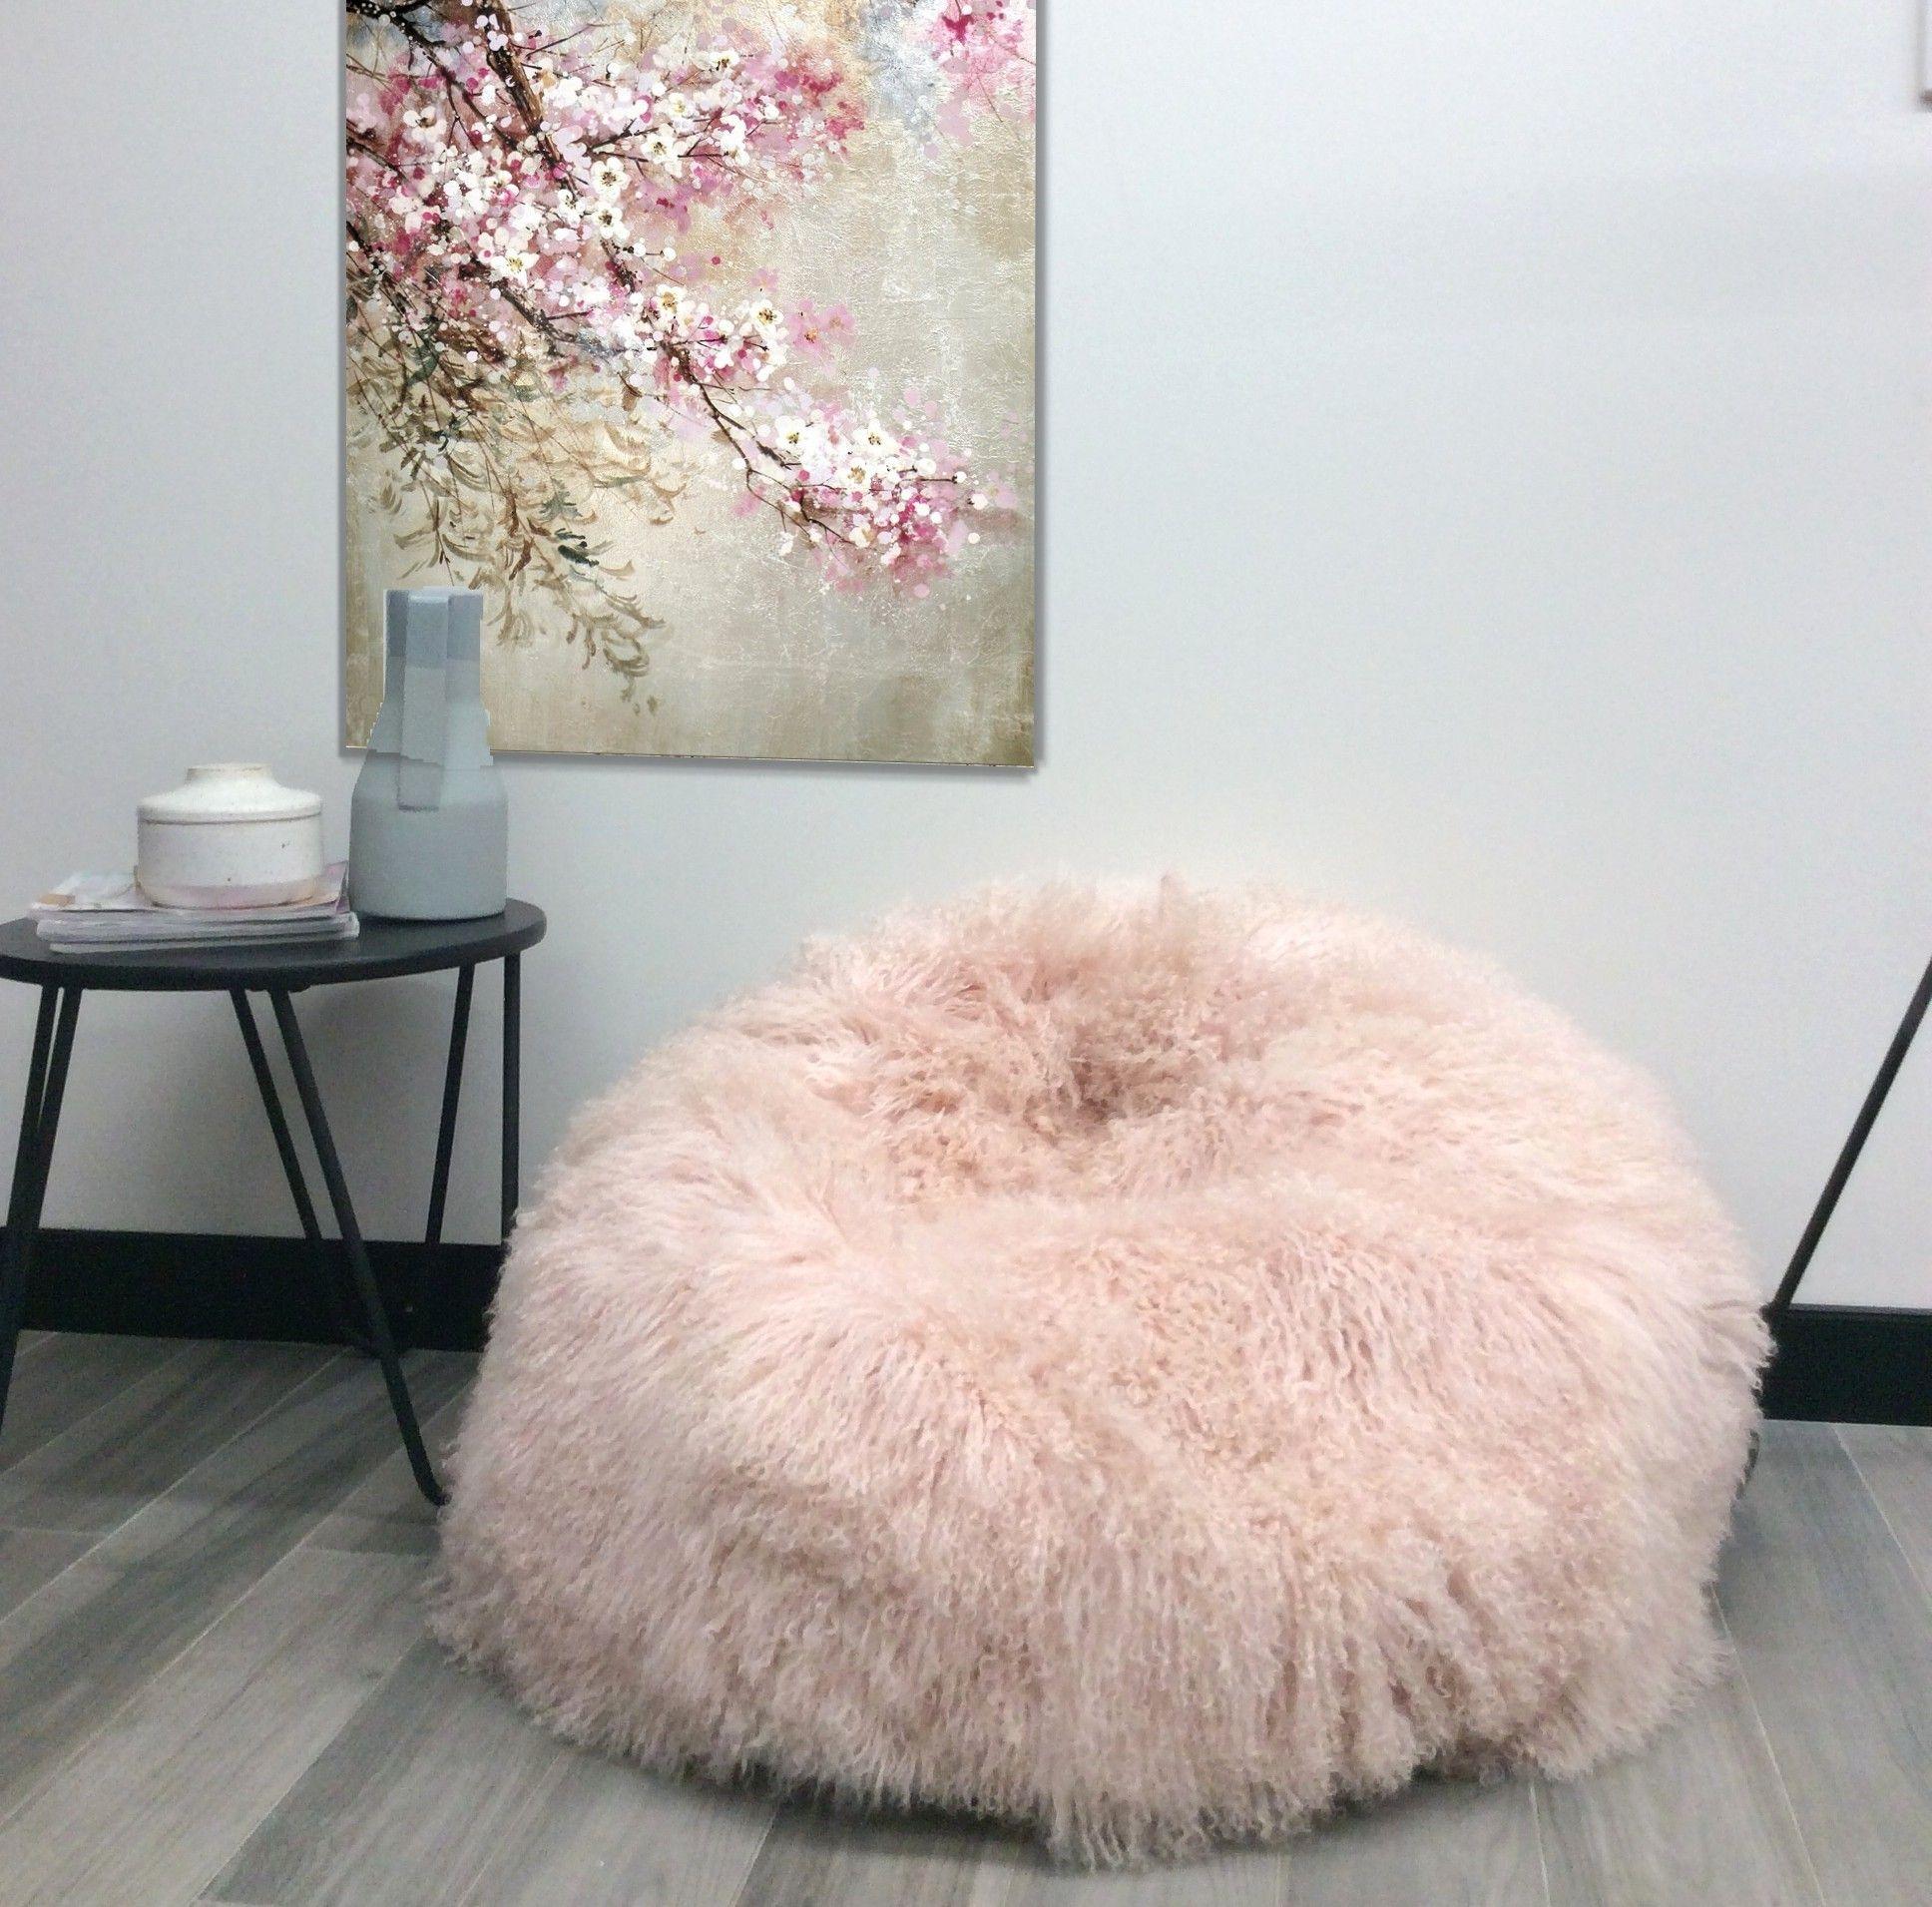 dd44bac9cc tibetan pink fur mongolian sheepskin bean bag eluxury home ...